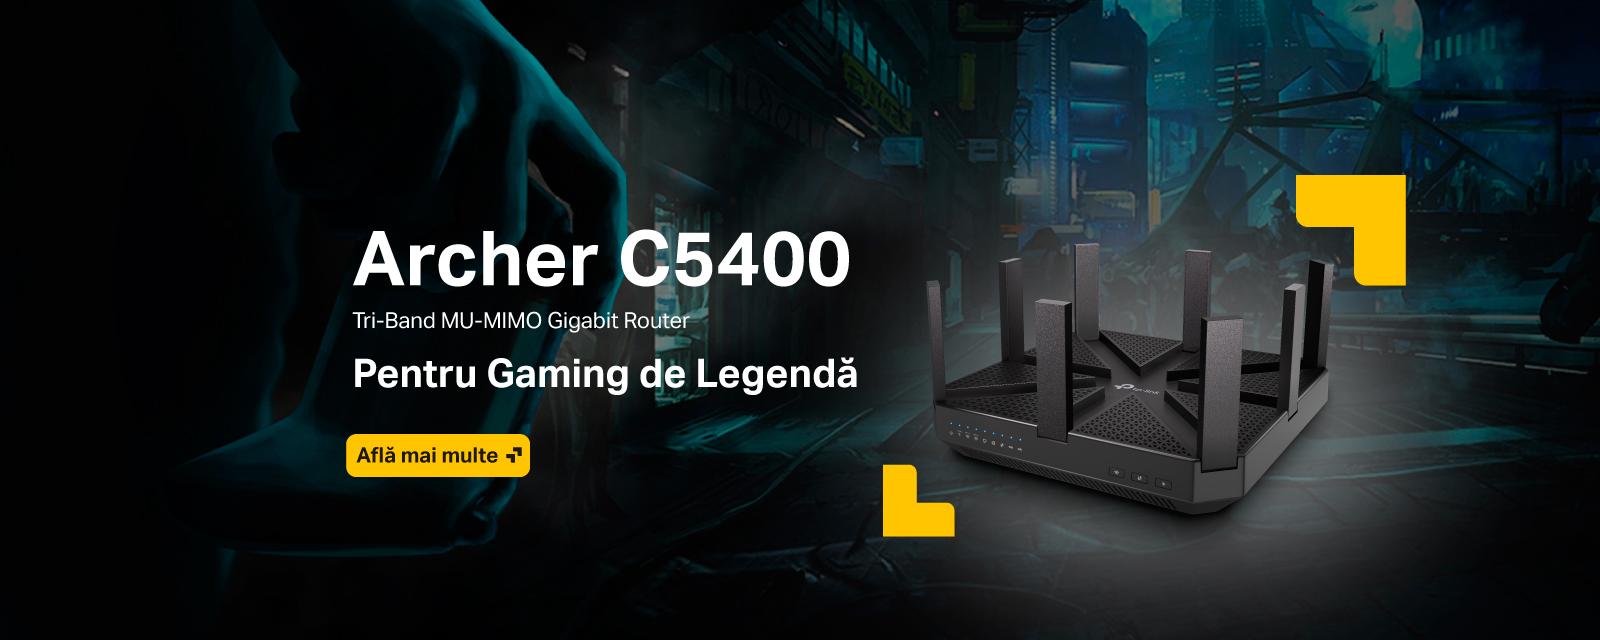 Archer C5400 - Pentru Gaming de Legenda